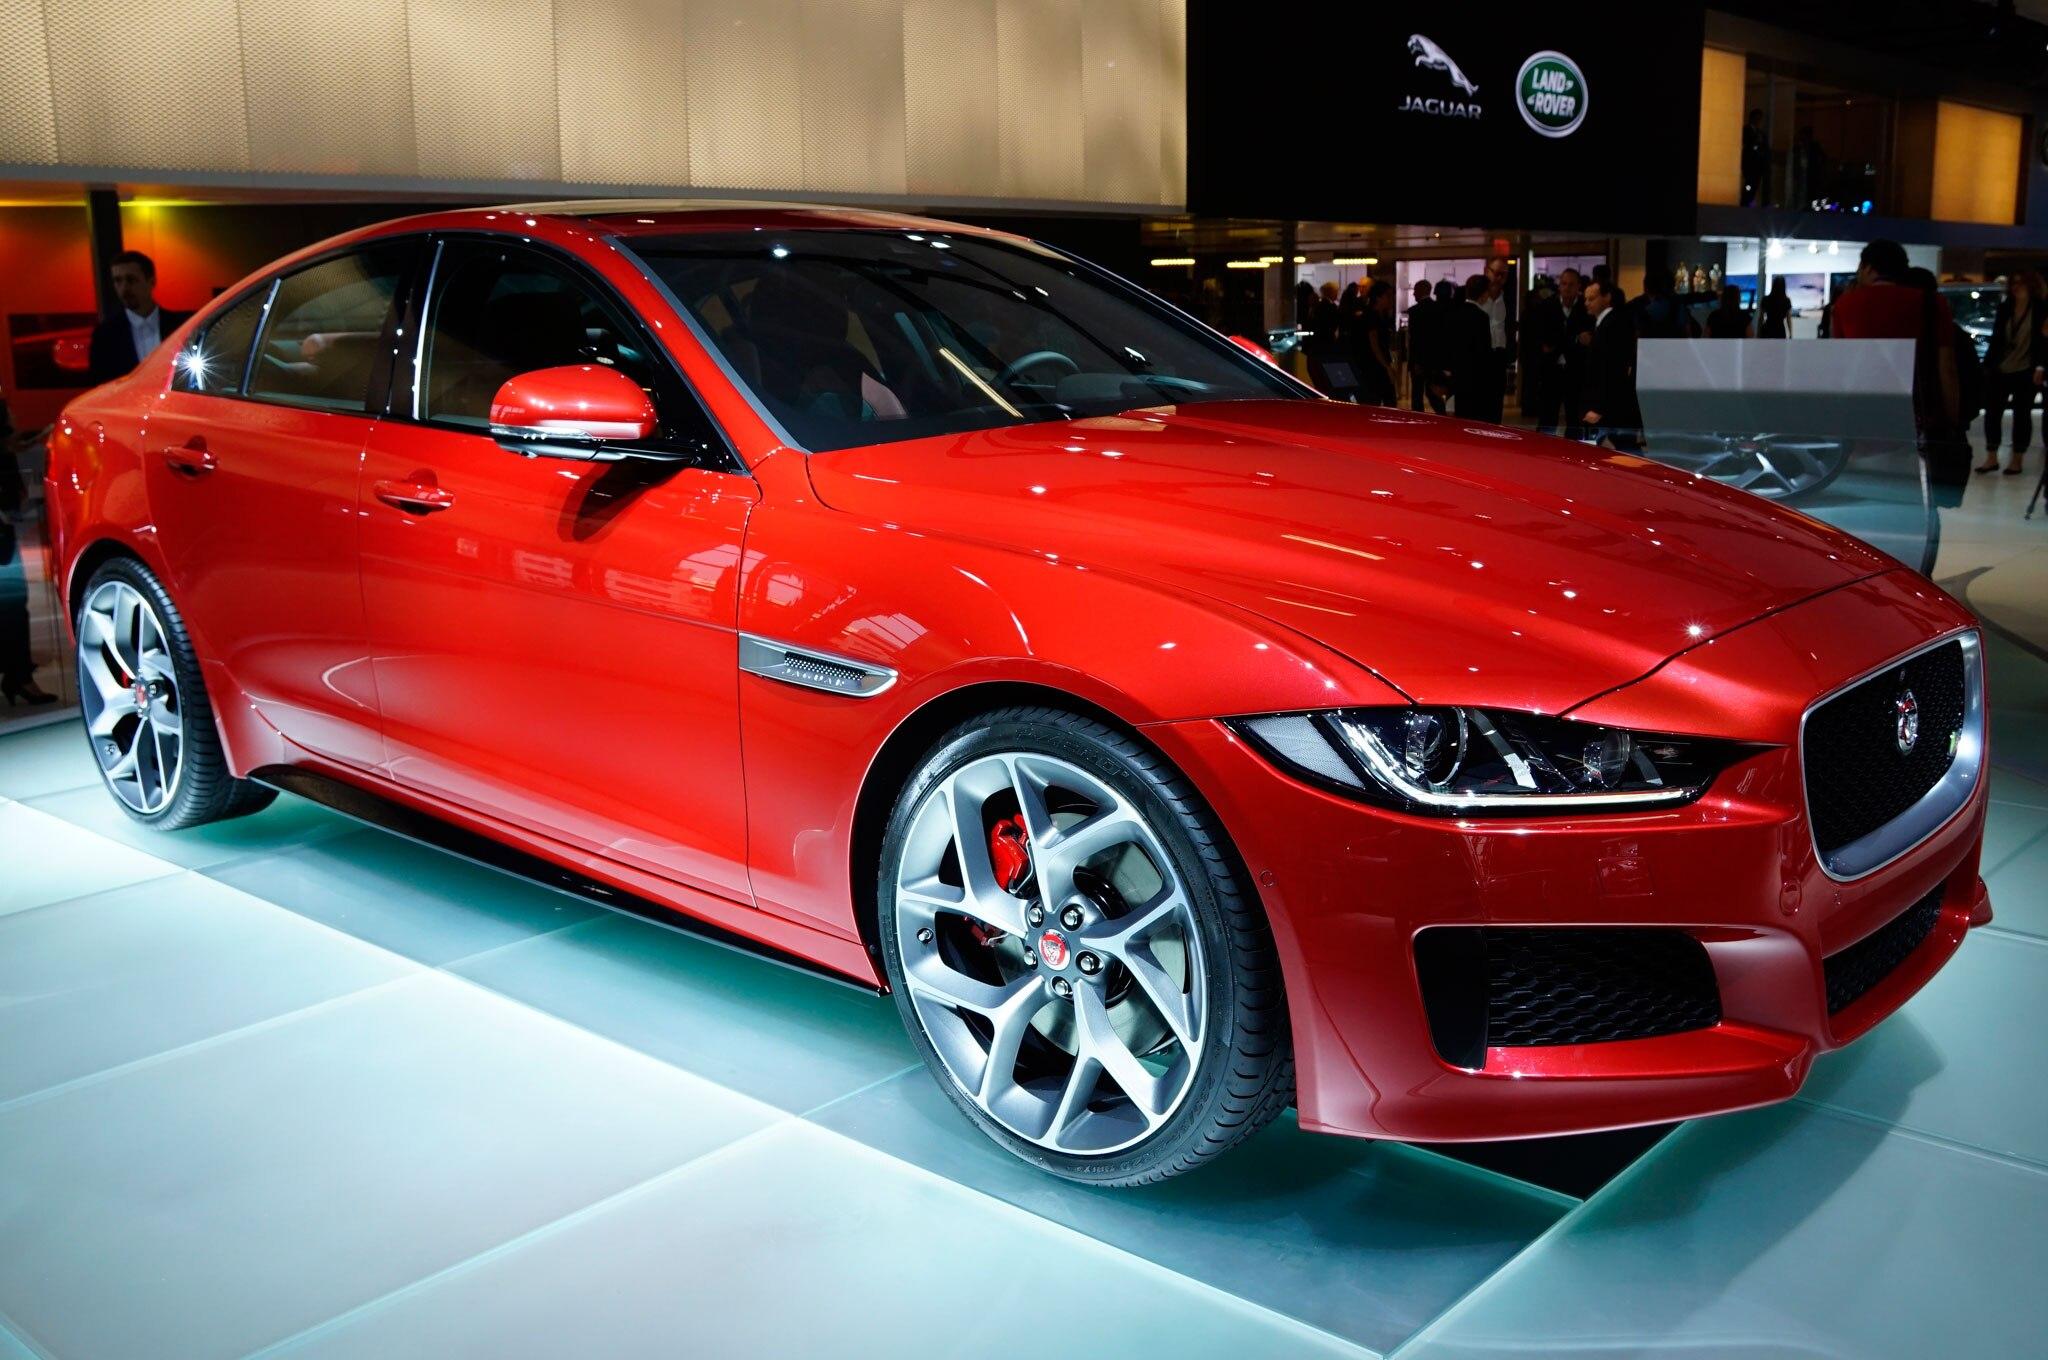 2016 Jaguar XE Front Three Quarter View 1